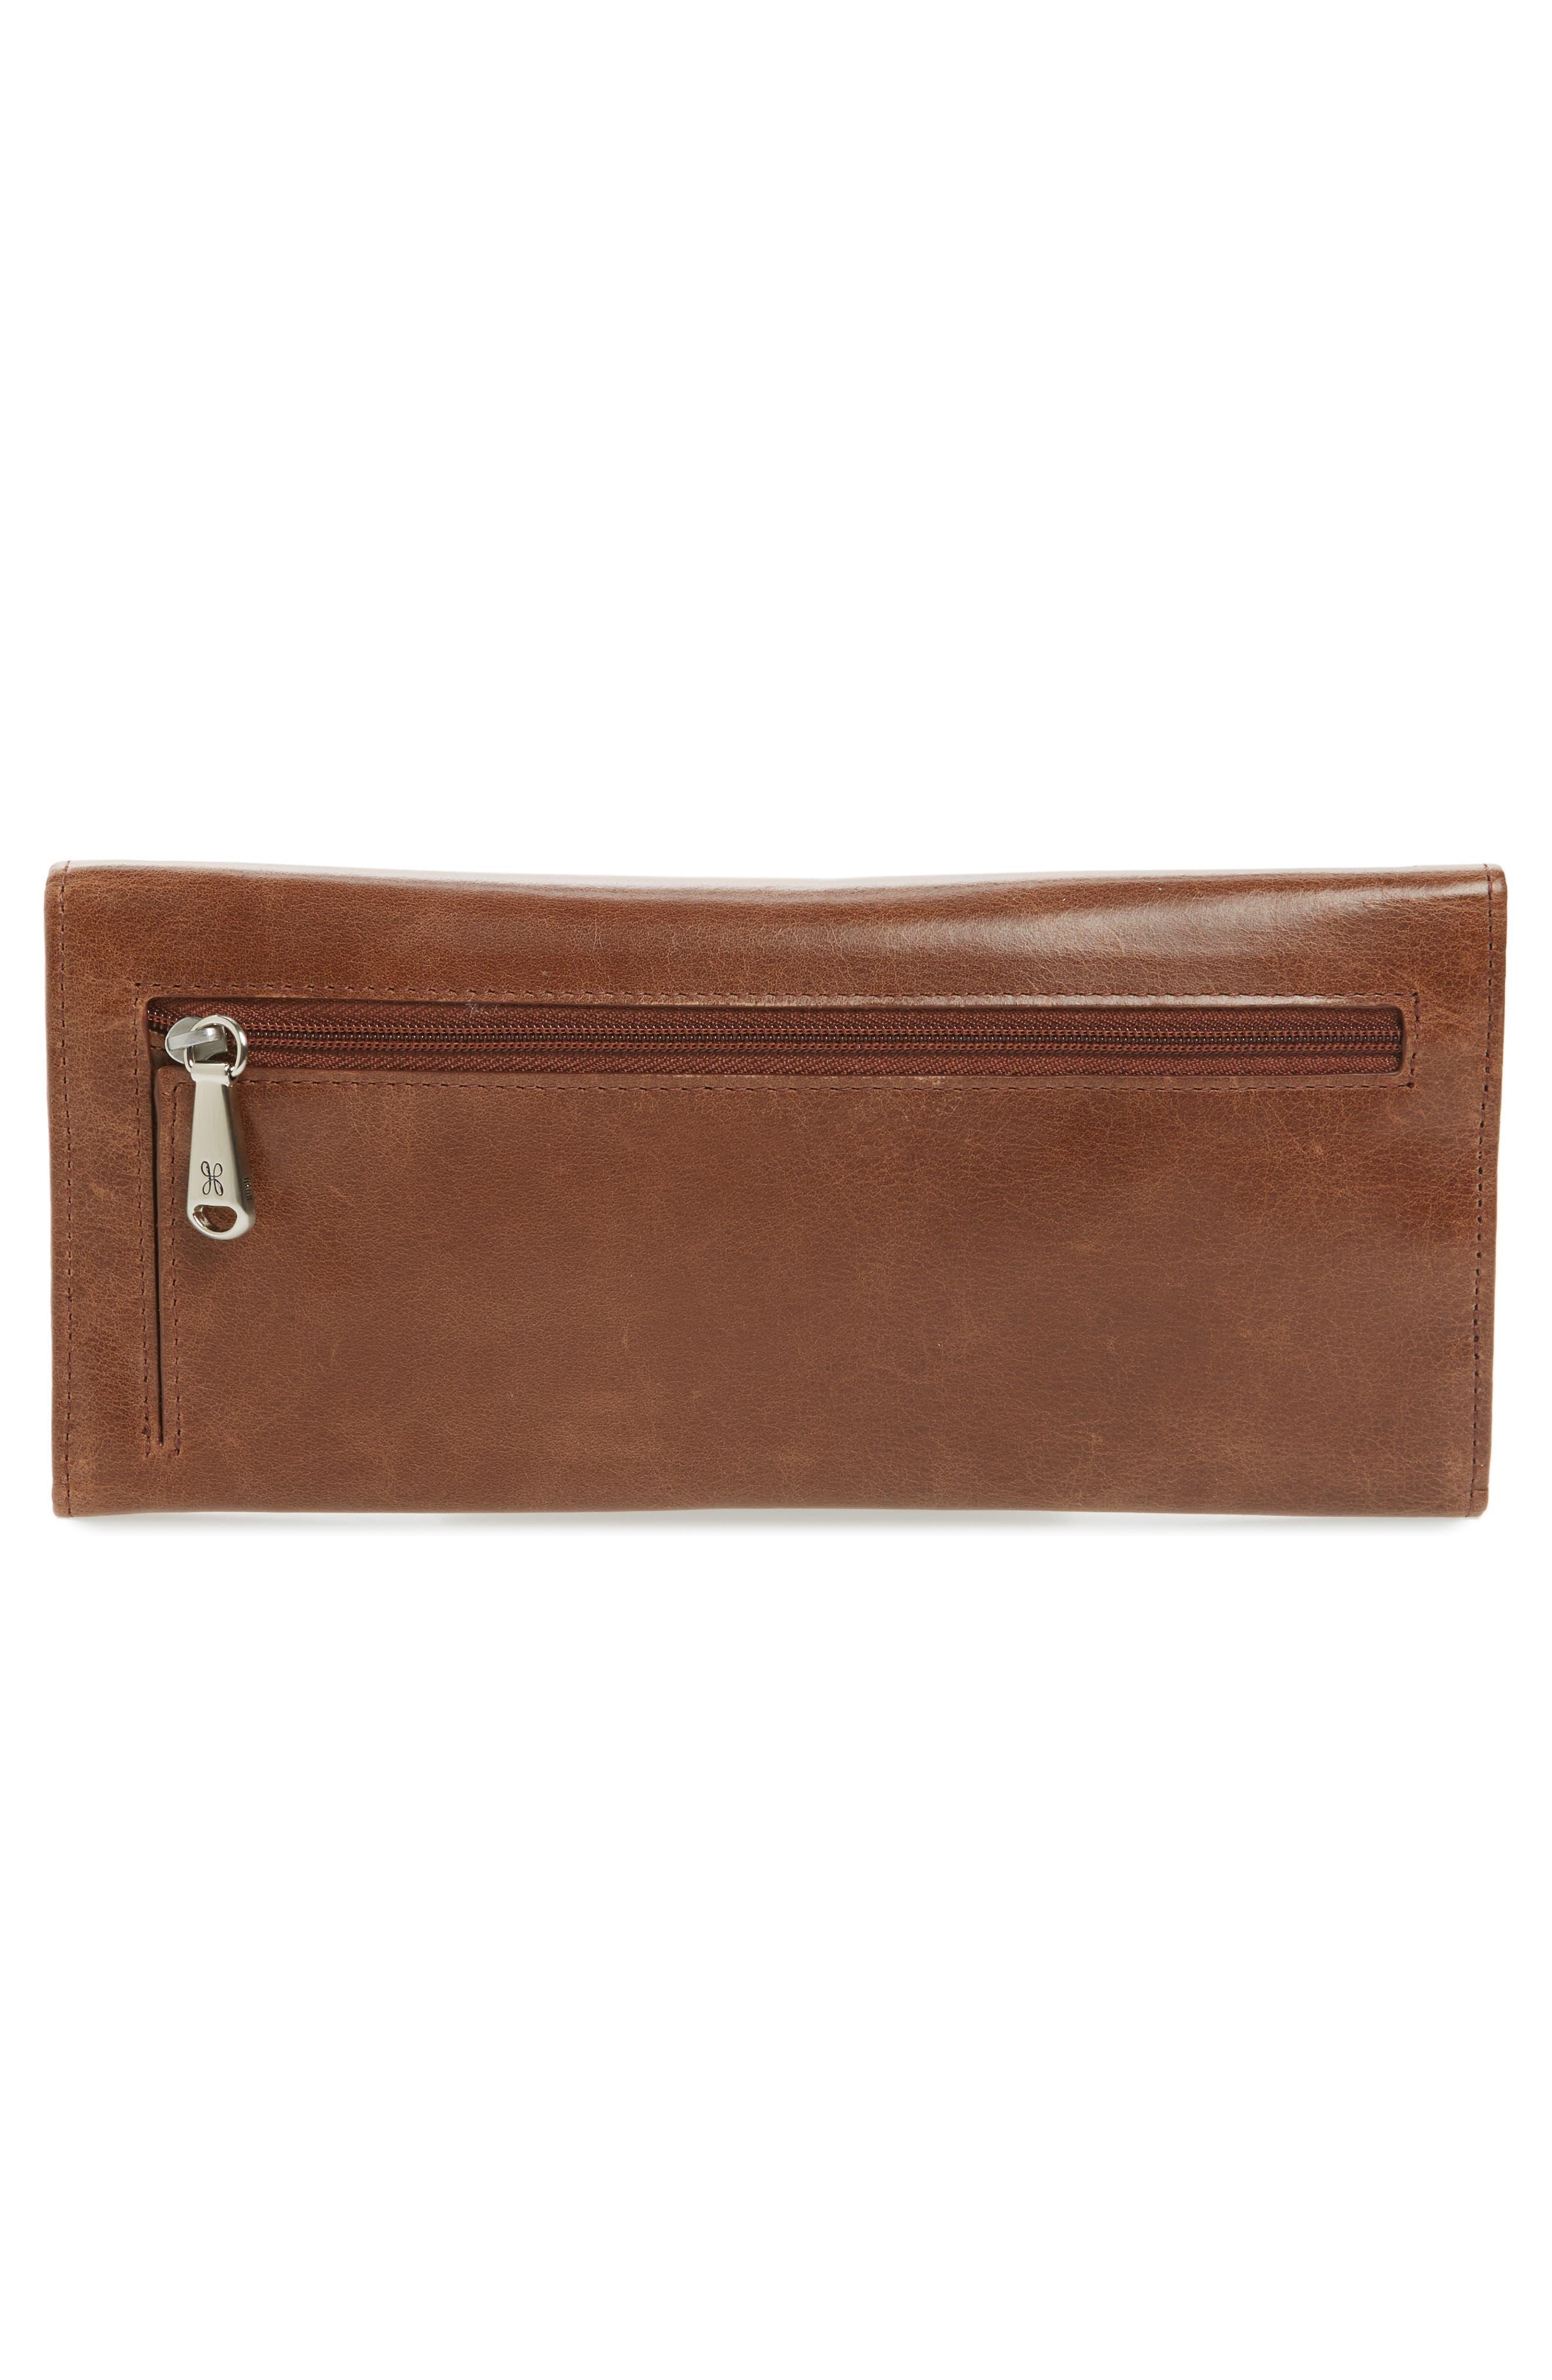 'Sadie' Leather Wallet,                             Alternate thumbnail 119, color,